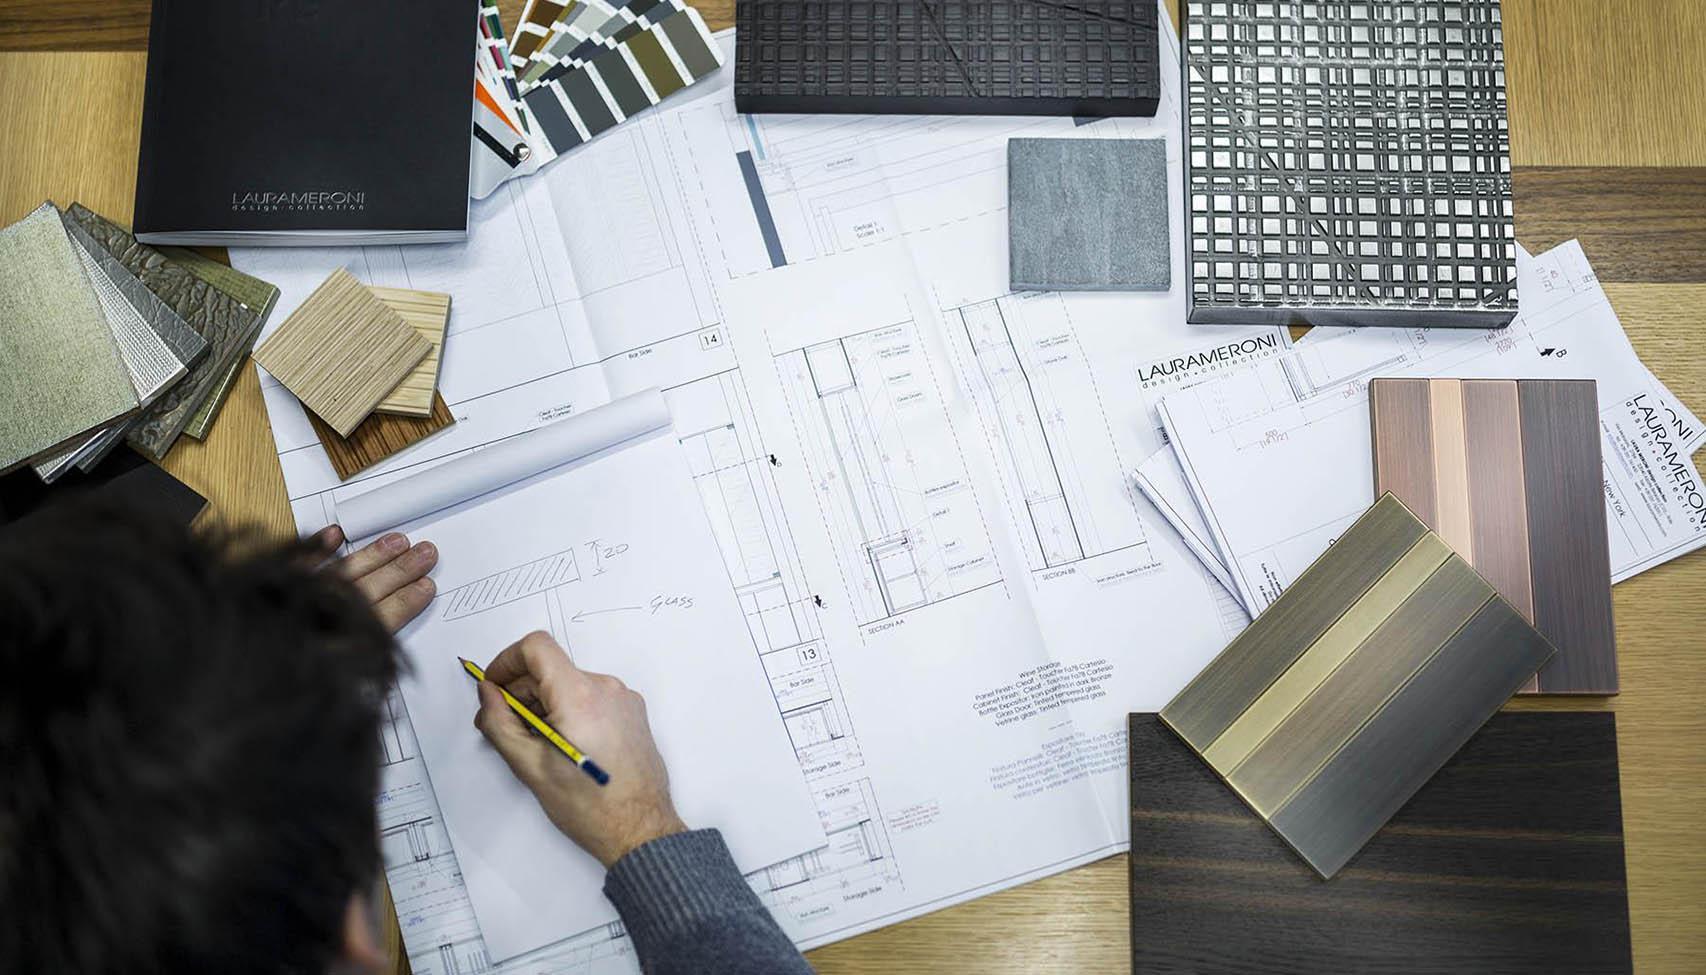 Laurameroni project design service architect and designer at work